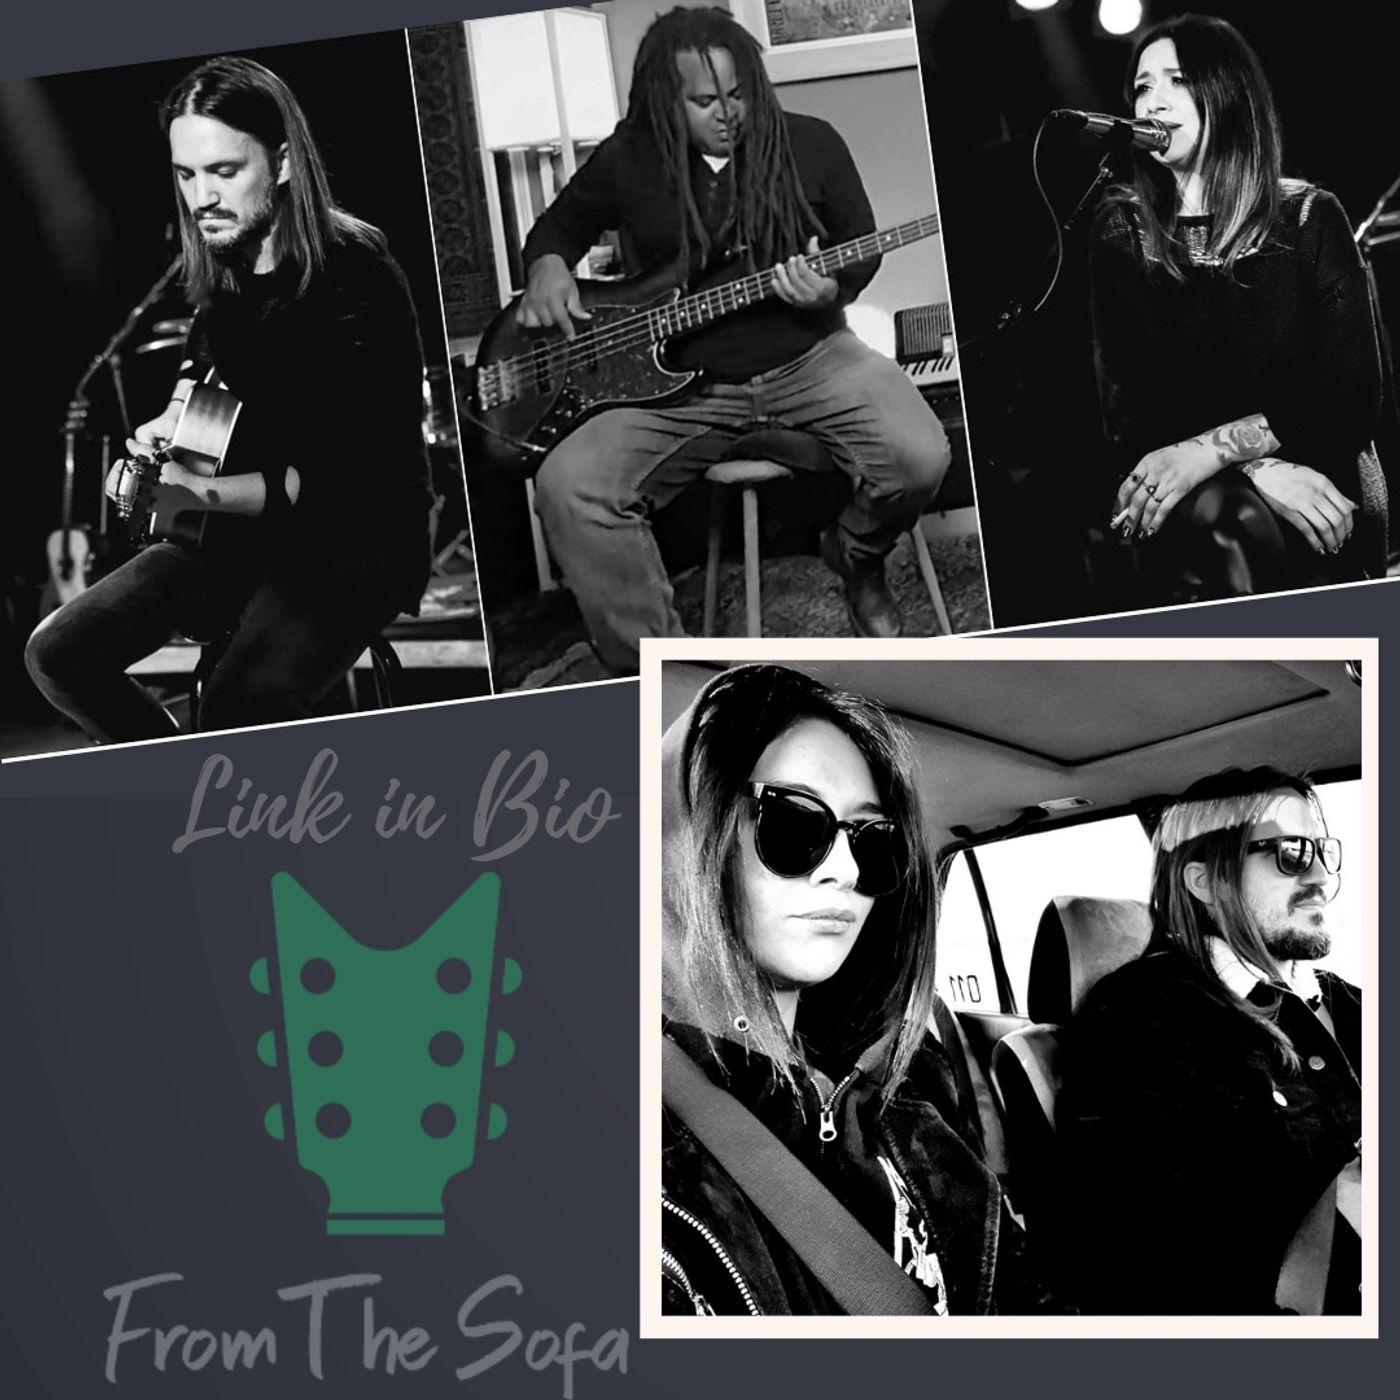 A bluesy sound with Americana influence?